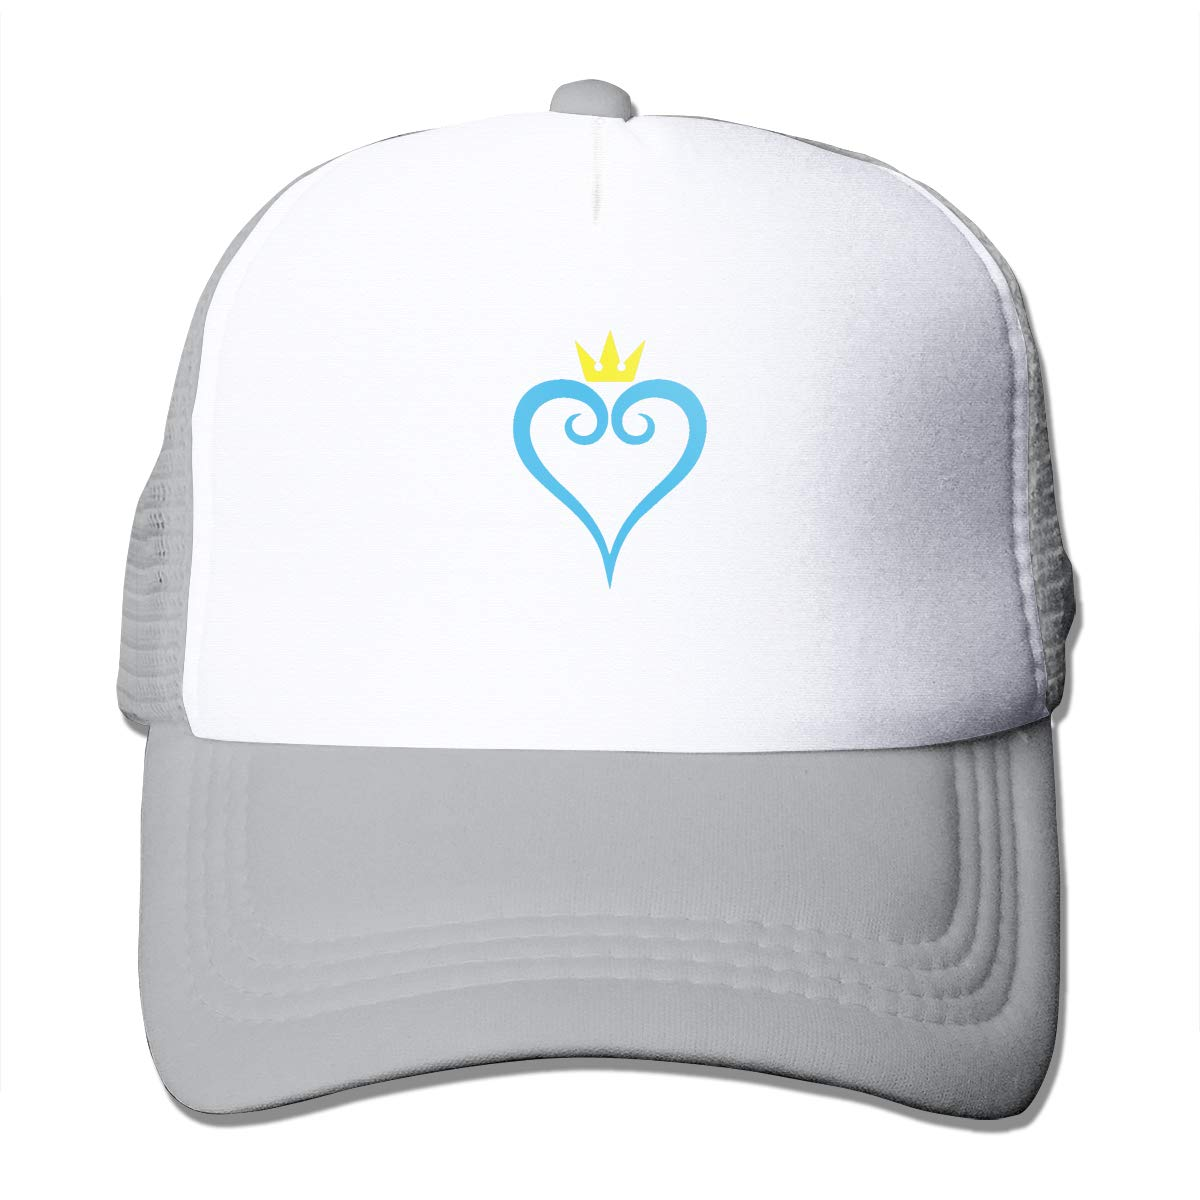 Bigsooyeest Kingdom Hearts Unisex Adult Trucker Cap Hat Mesh Back Trucker Hats